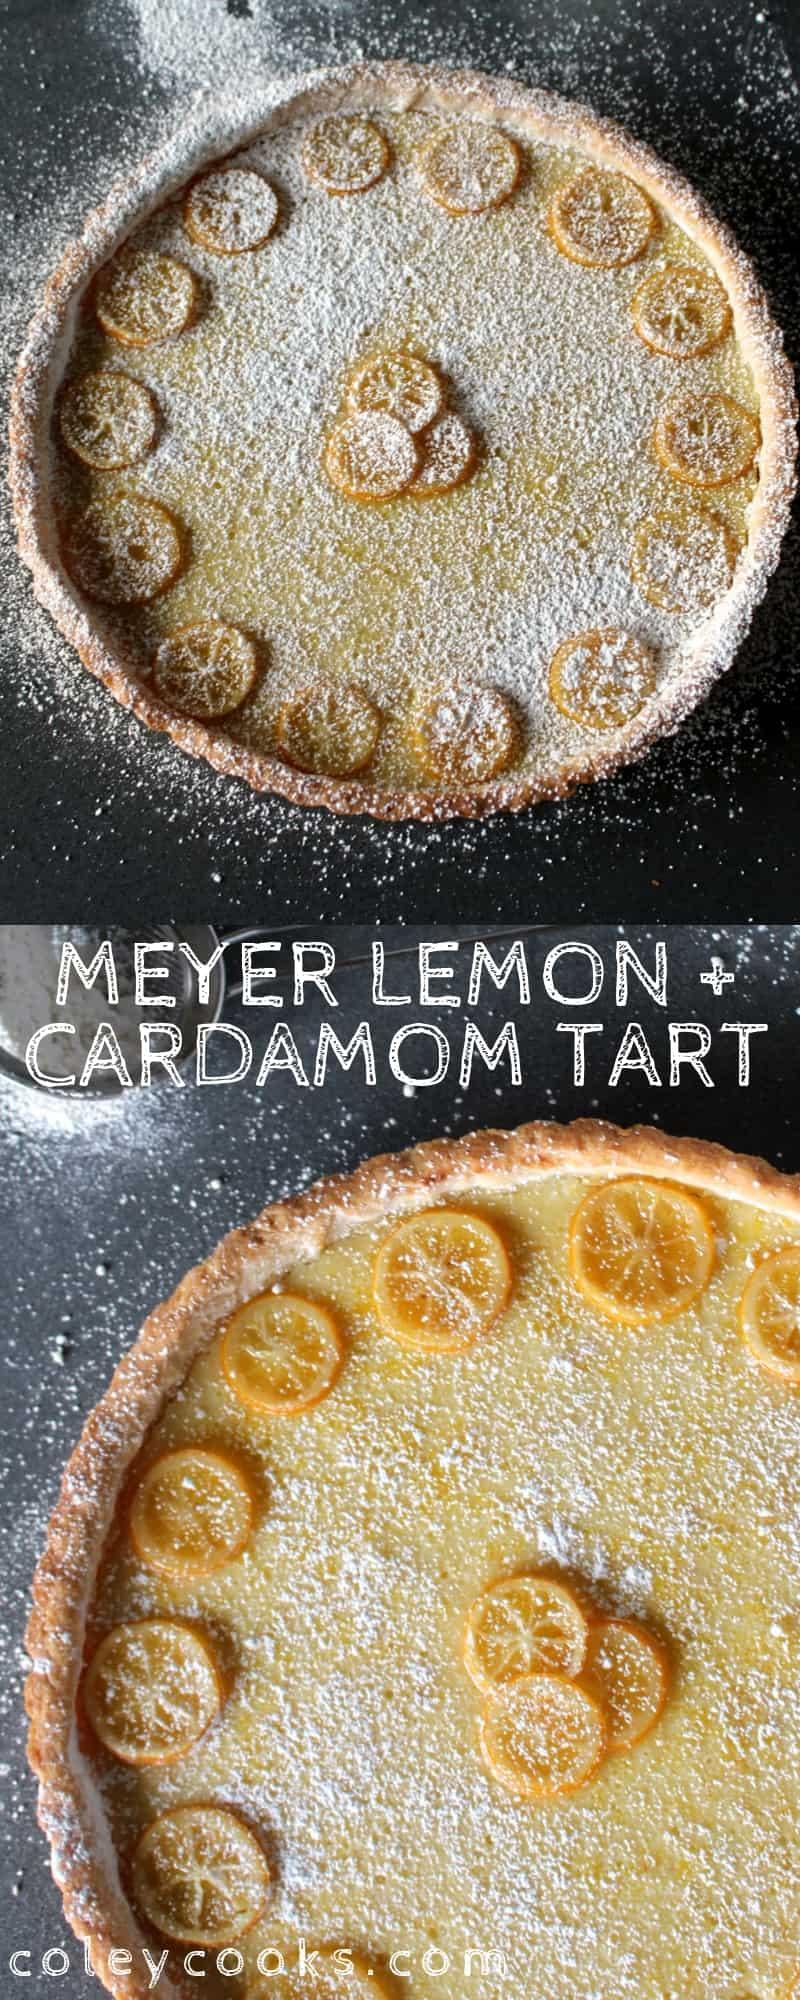 This Meyer Lemon and Cardamom Tart showcases one of my favorite flavor pairings of all time: Meyer lemon and cardamom. A bright, citrusy tart that's perfect for spring. #easy #lemon #cardamom #tart #recipe #citrus #dessert | Coleycooks.com